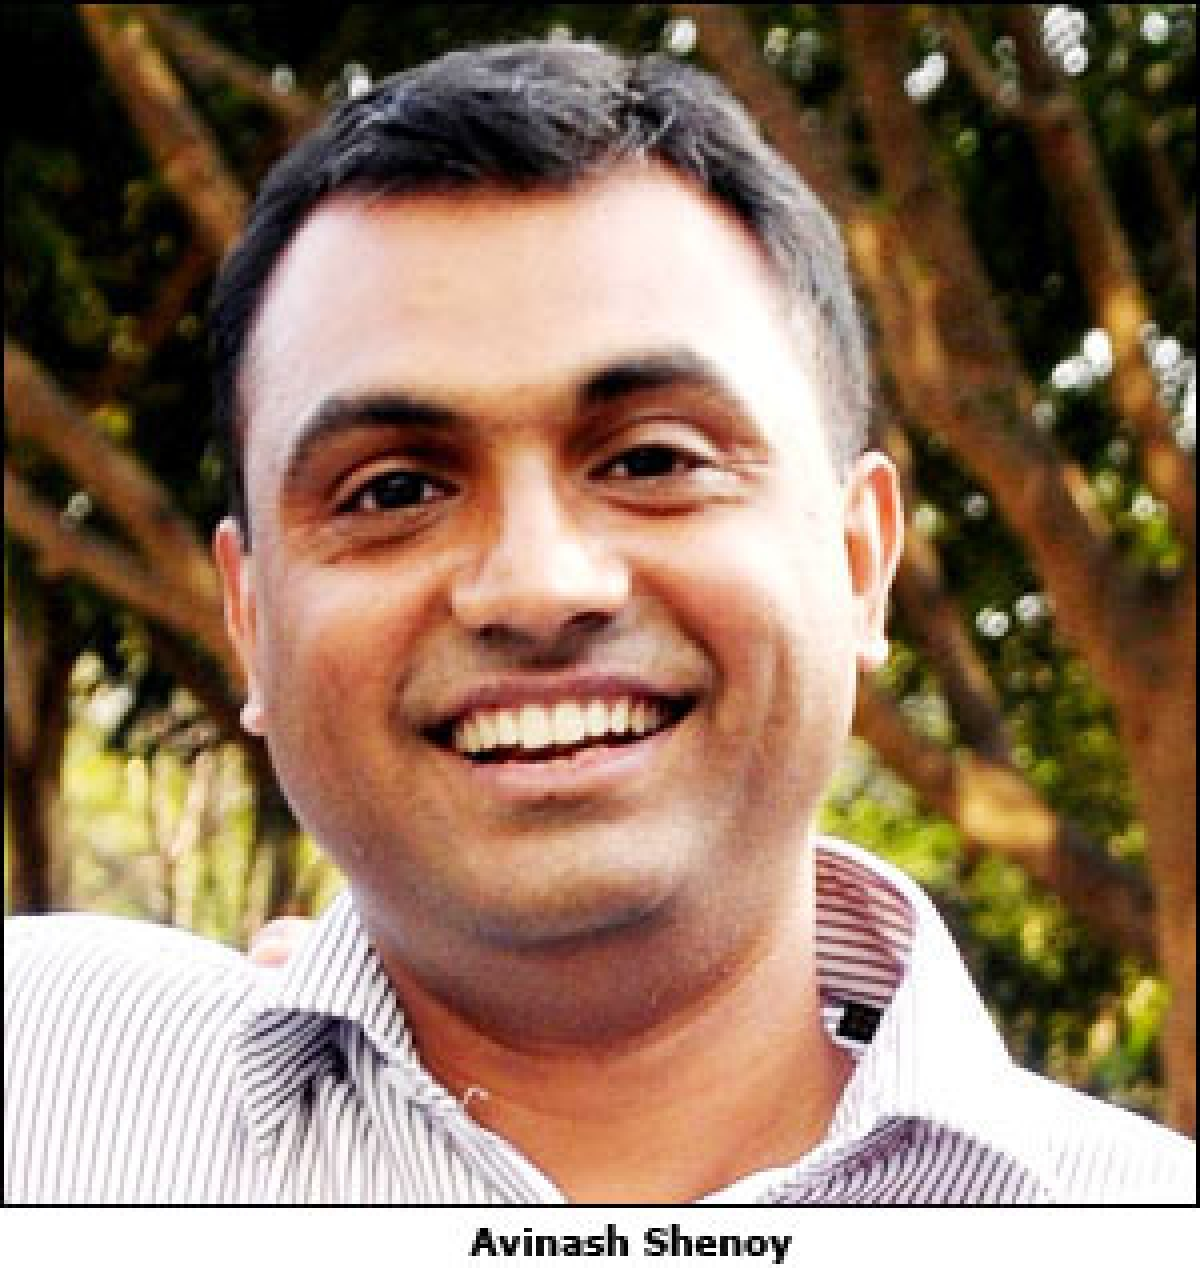 Law & Kenneth ropes in PepsiCo's Avinash Shenoy